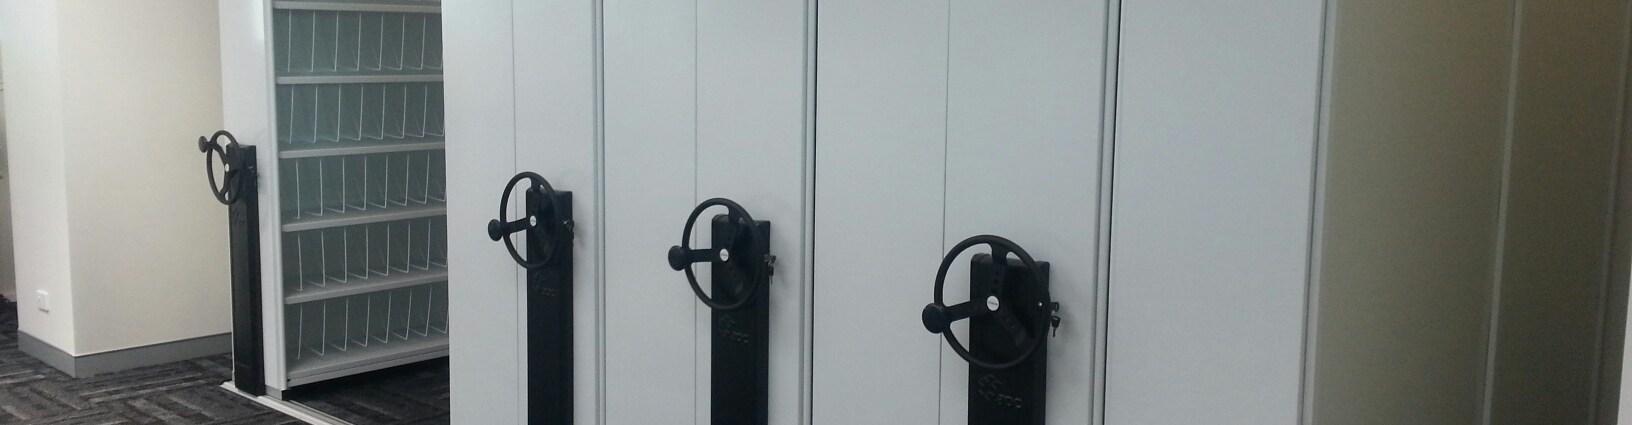 Compactafile Ezi-Drive